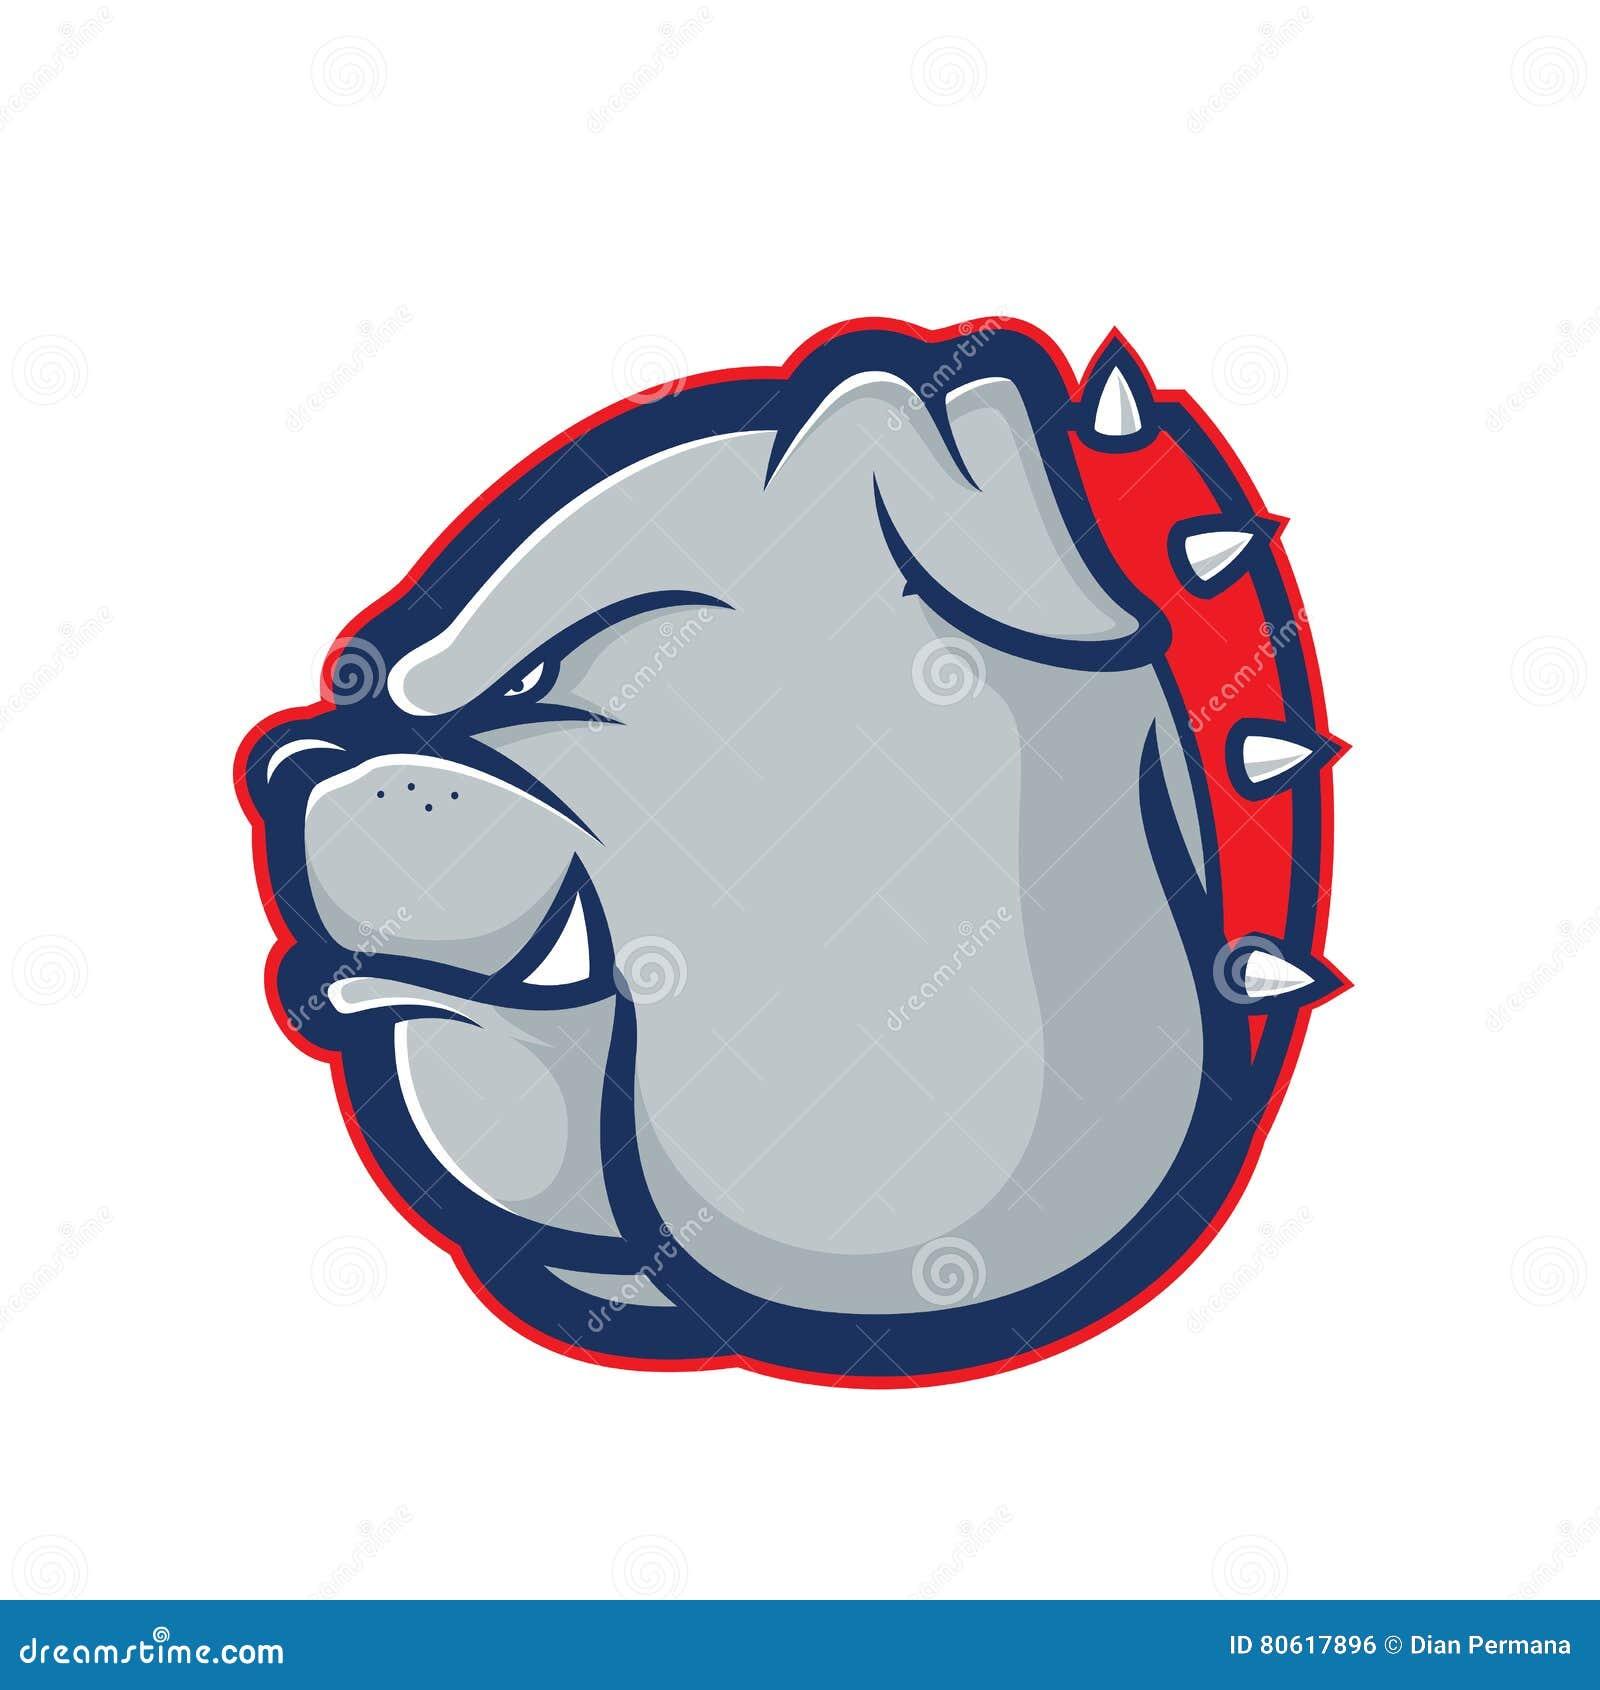 Bulldog Head Mascot Stock Vector Illustration Of Graphic 80617896